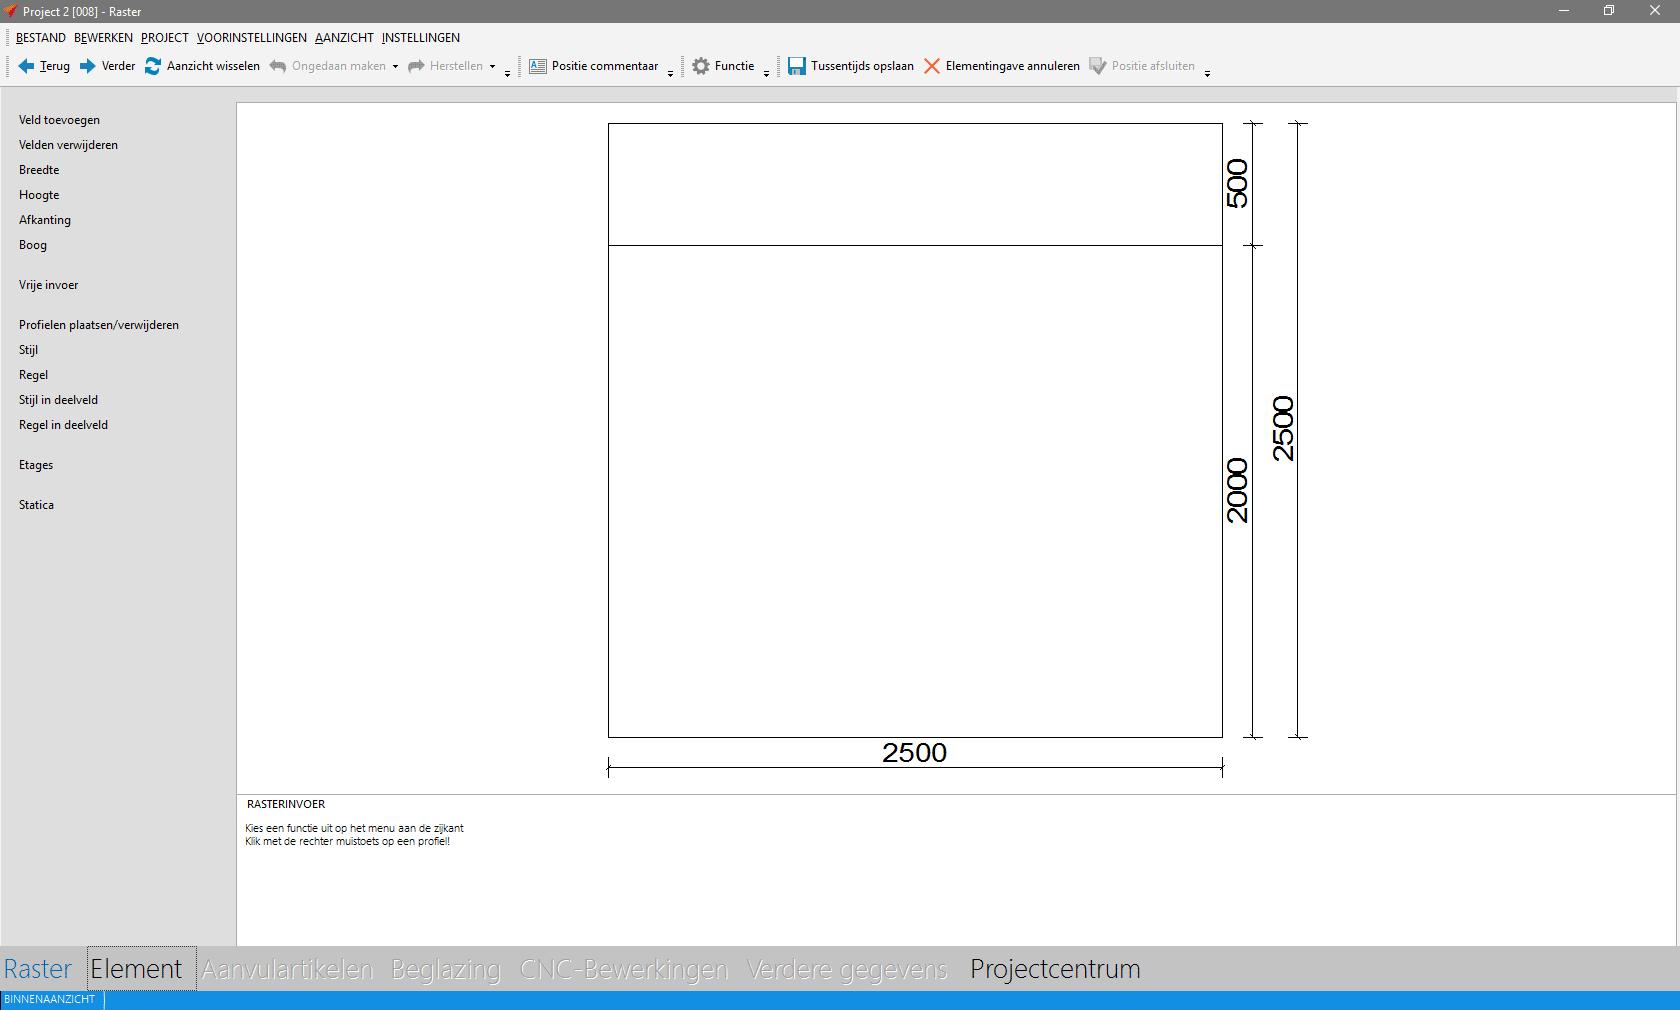 NL-2016-Positionsgeruest-003